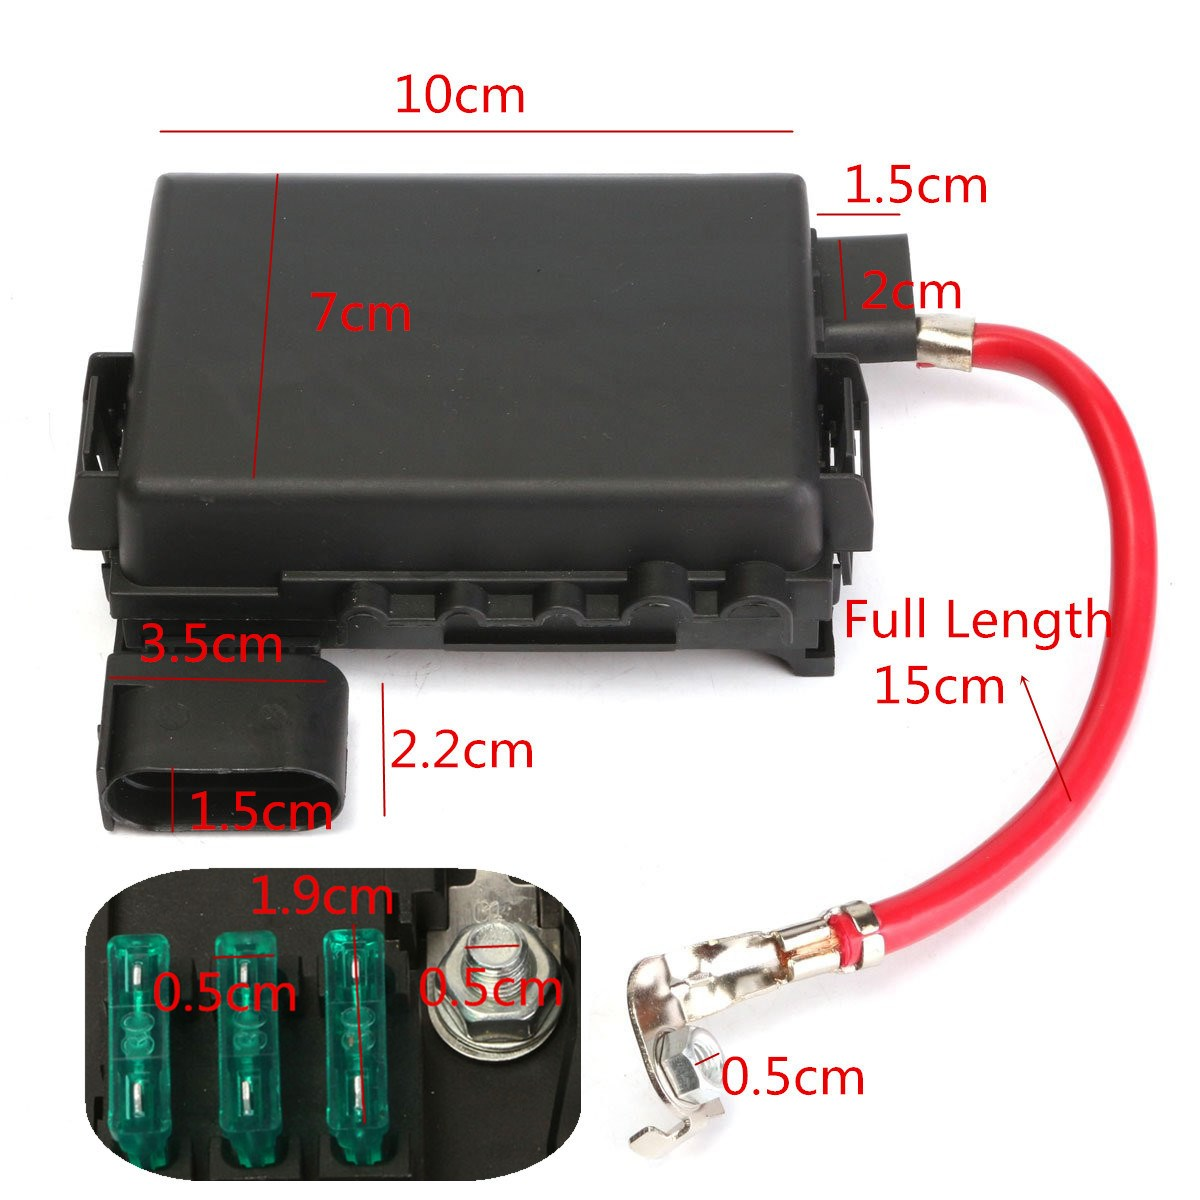 hight resolution of fuse box battery terminal insurance tablets for vw jetta golf mk4 2003 jetta fuse box diagram